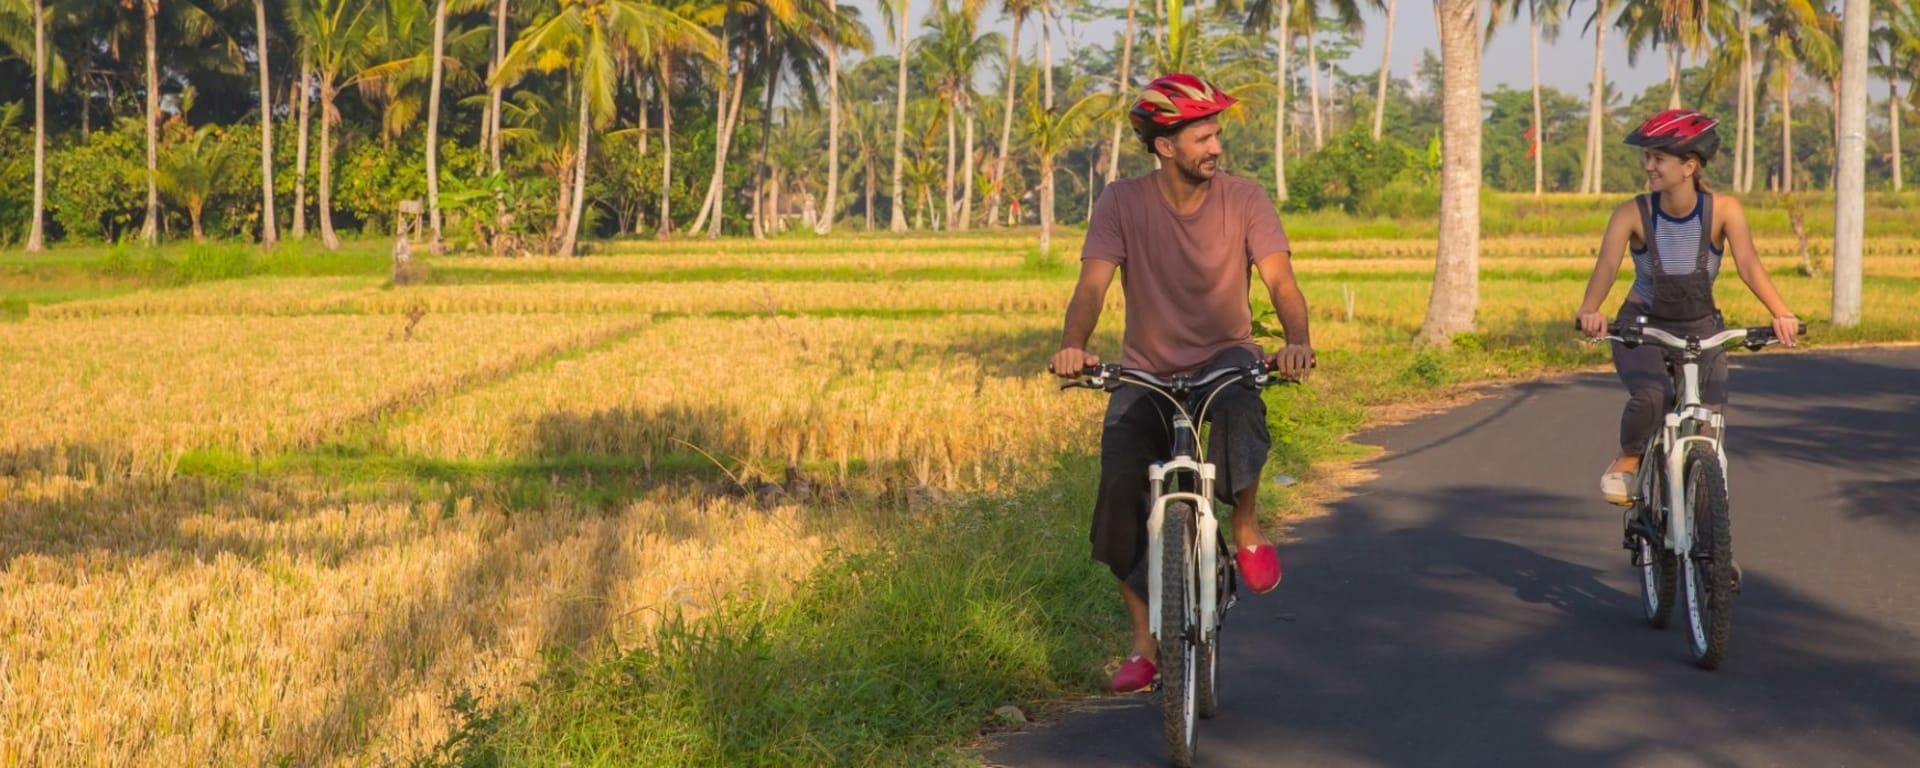 Bali aktiv erleben ab Südbali: Bali - Couple riding a bicycle through the tropical island of Bali